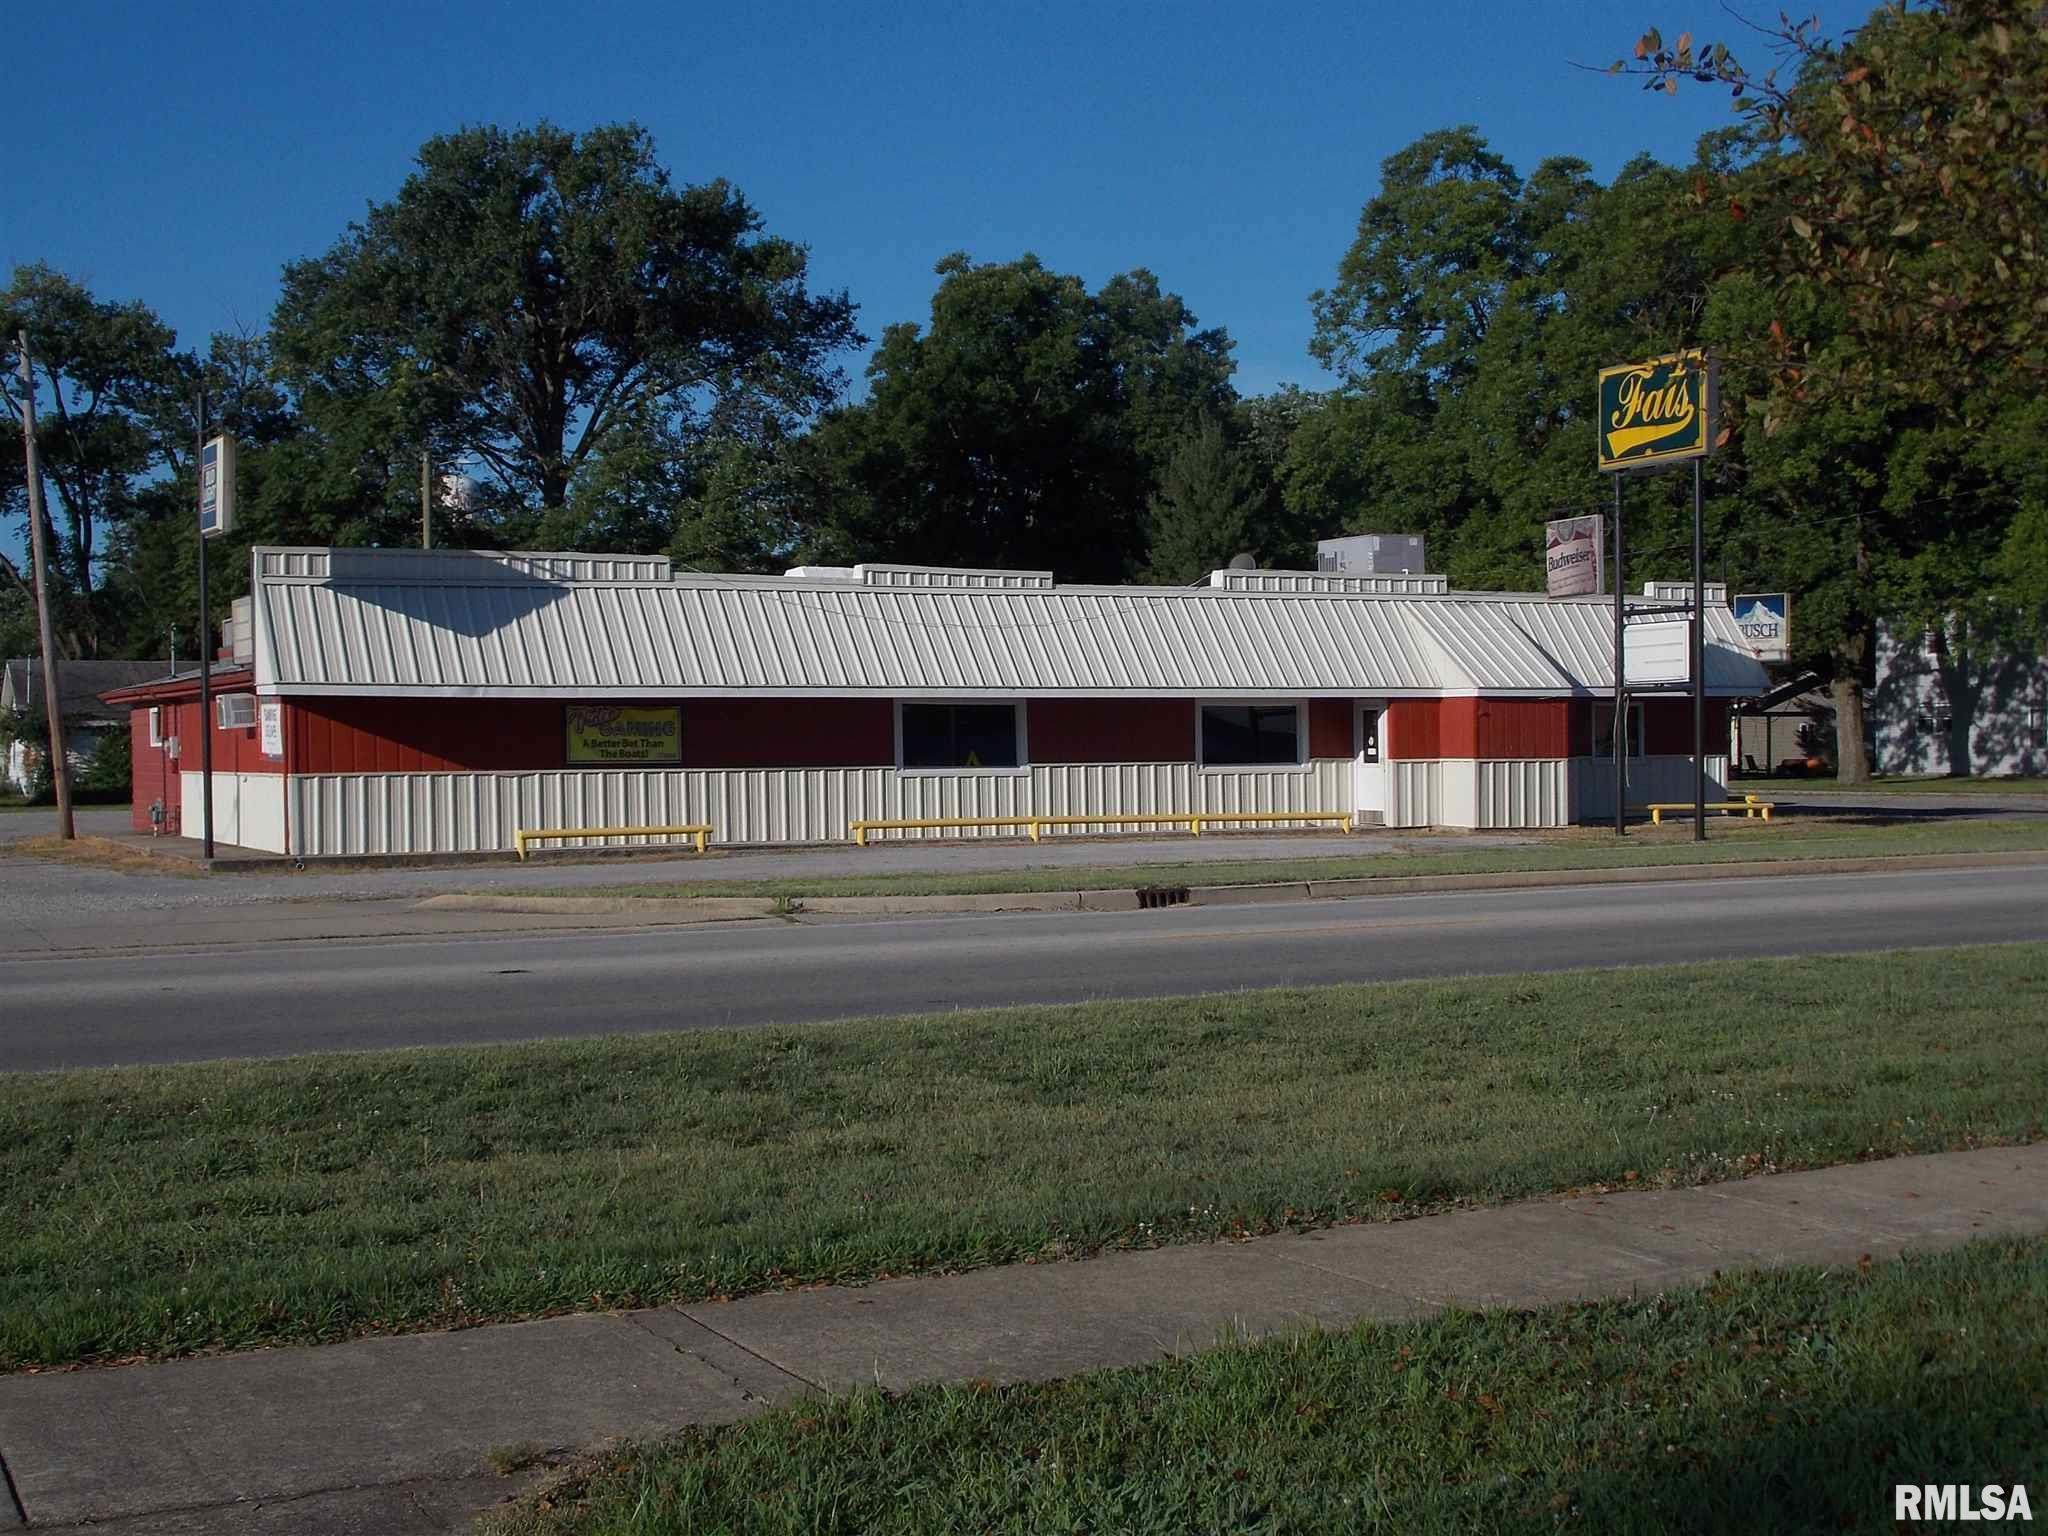 106 MISSOURI Property Photo - Sandoval, IL real estate listing